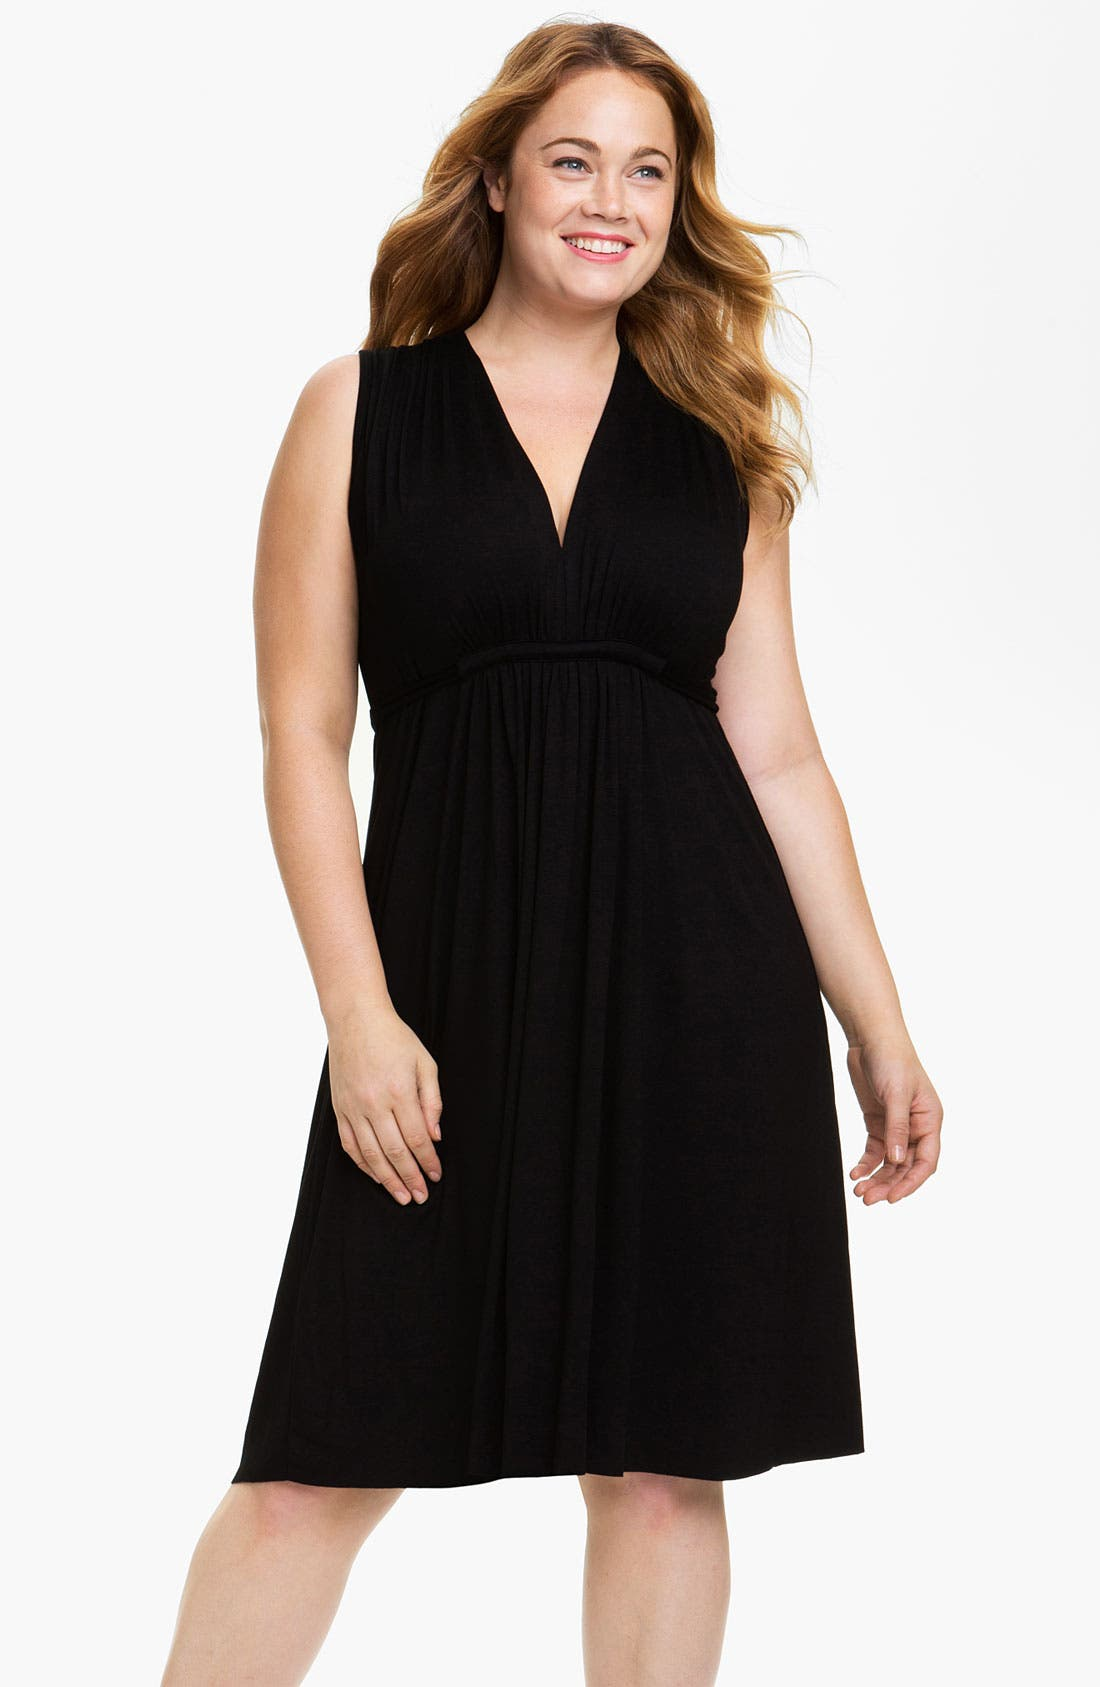 Alternate Image 1 Selected - Rachel Pally White Label Sleeveless Caftan Dress (Plus)